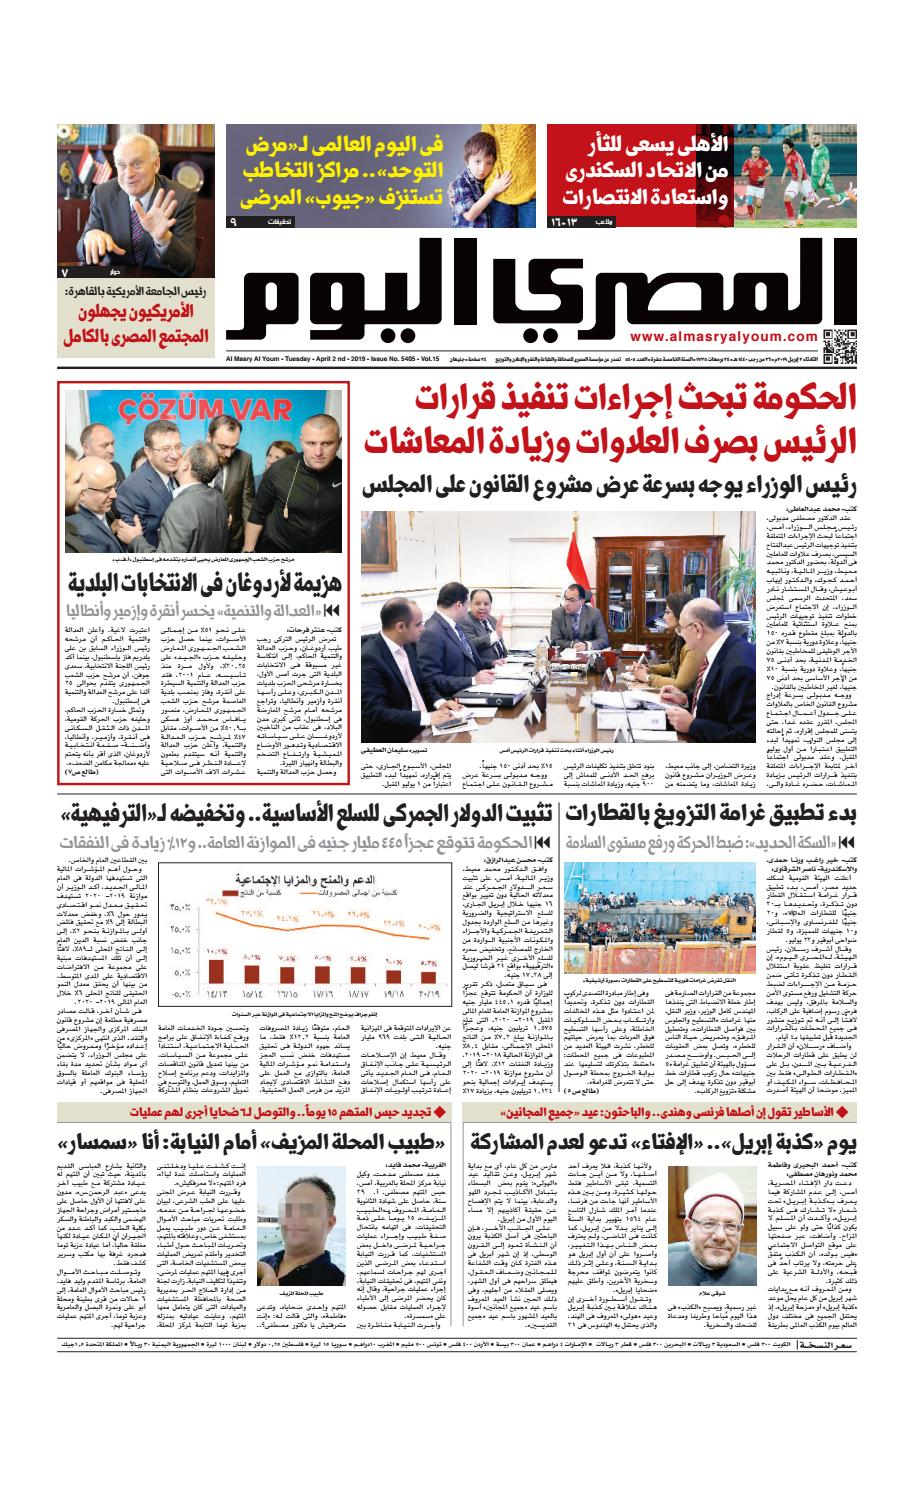 6c4d39a5313d5 عدد الثلاثاء ٢-٤-٢٠١٩ by Al Masry Media Corp - issuu